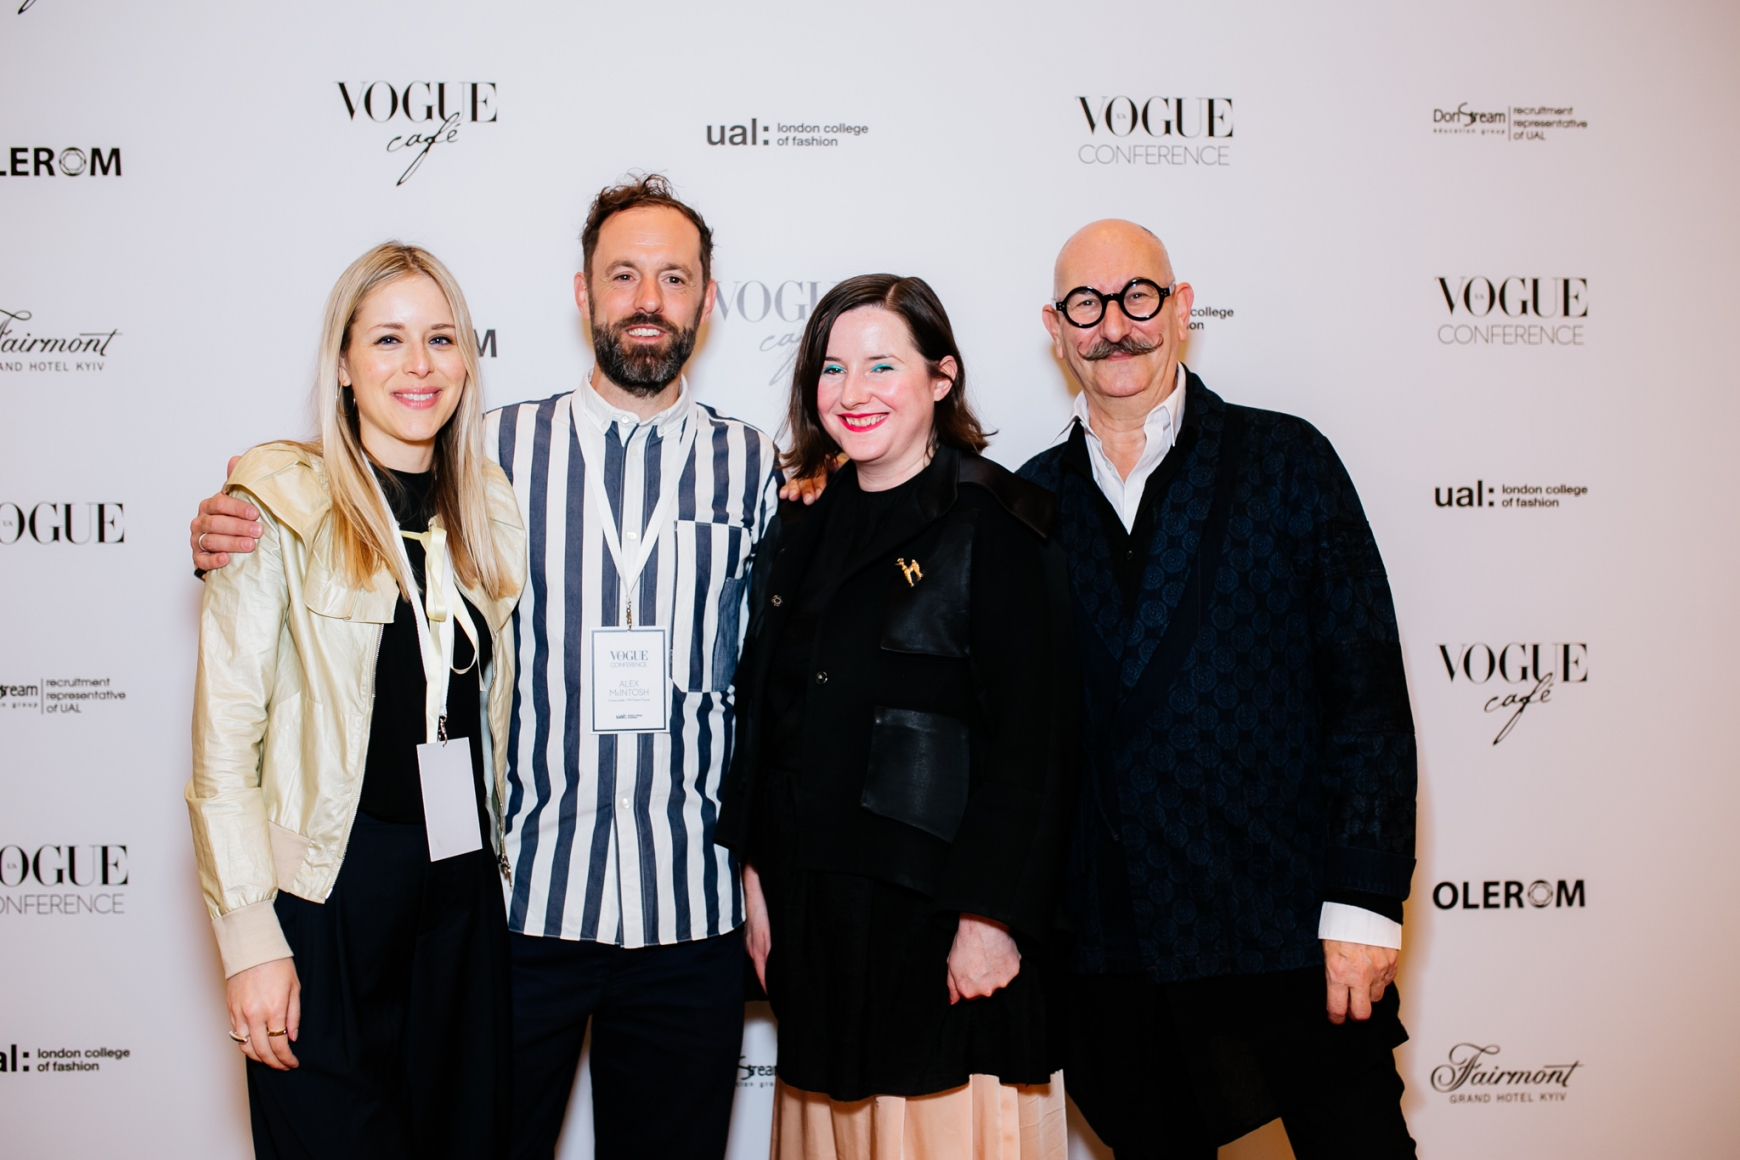 Vogue conference UA